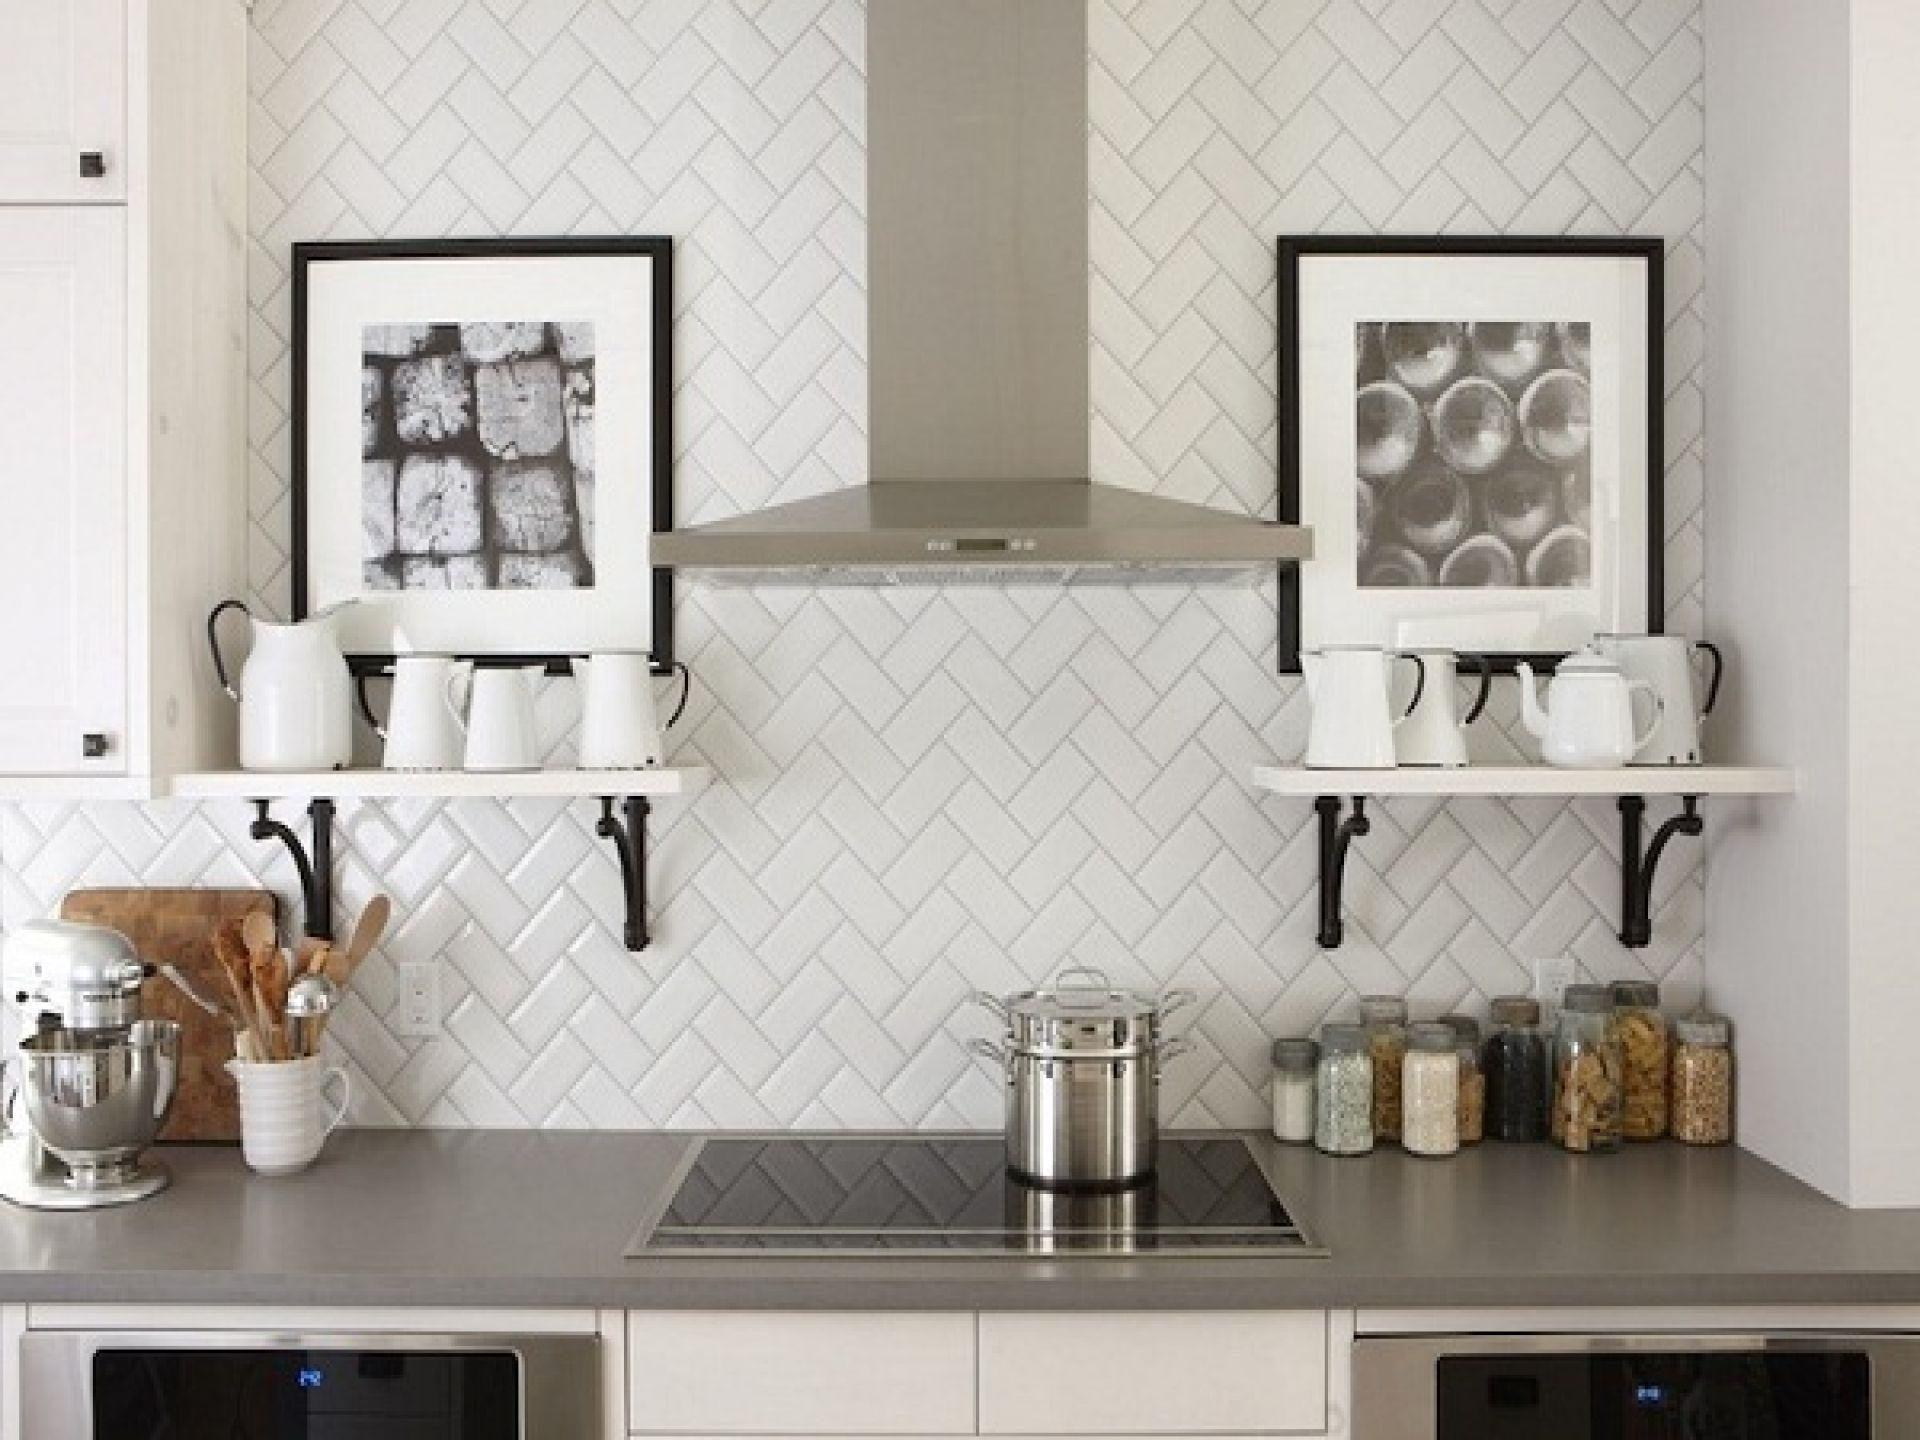 Subway tile patterned backsplash kitchen ideas and decor